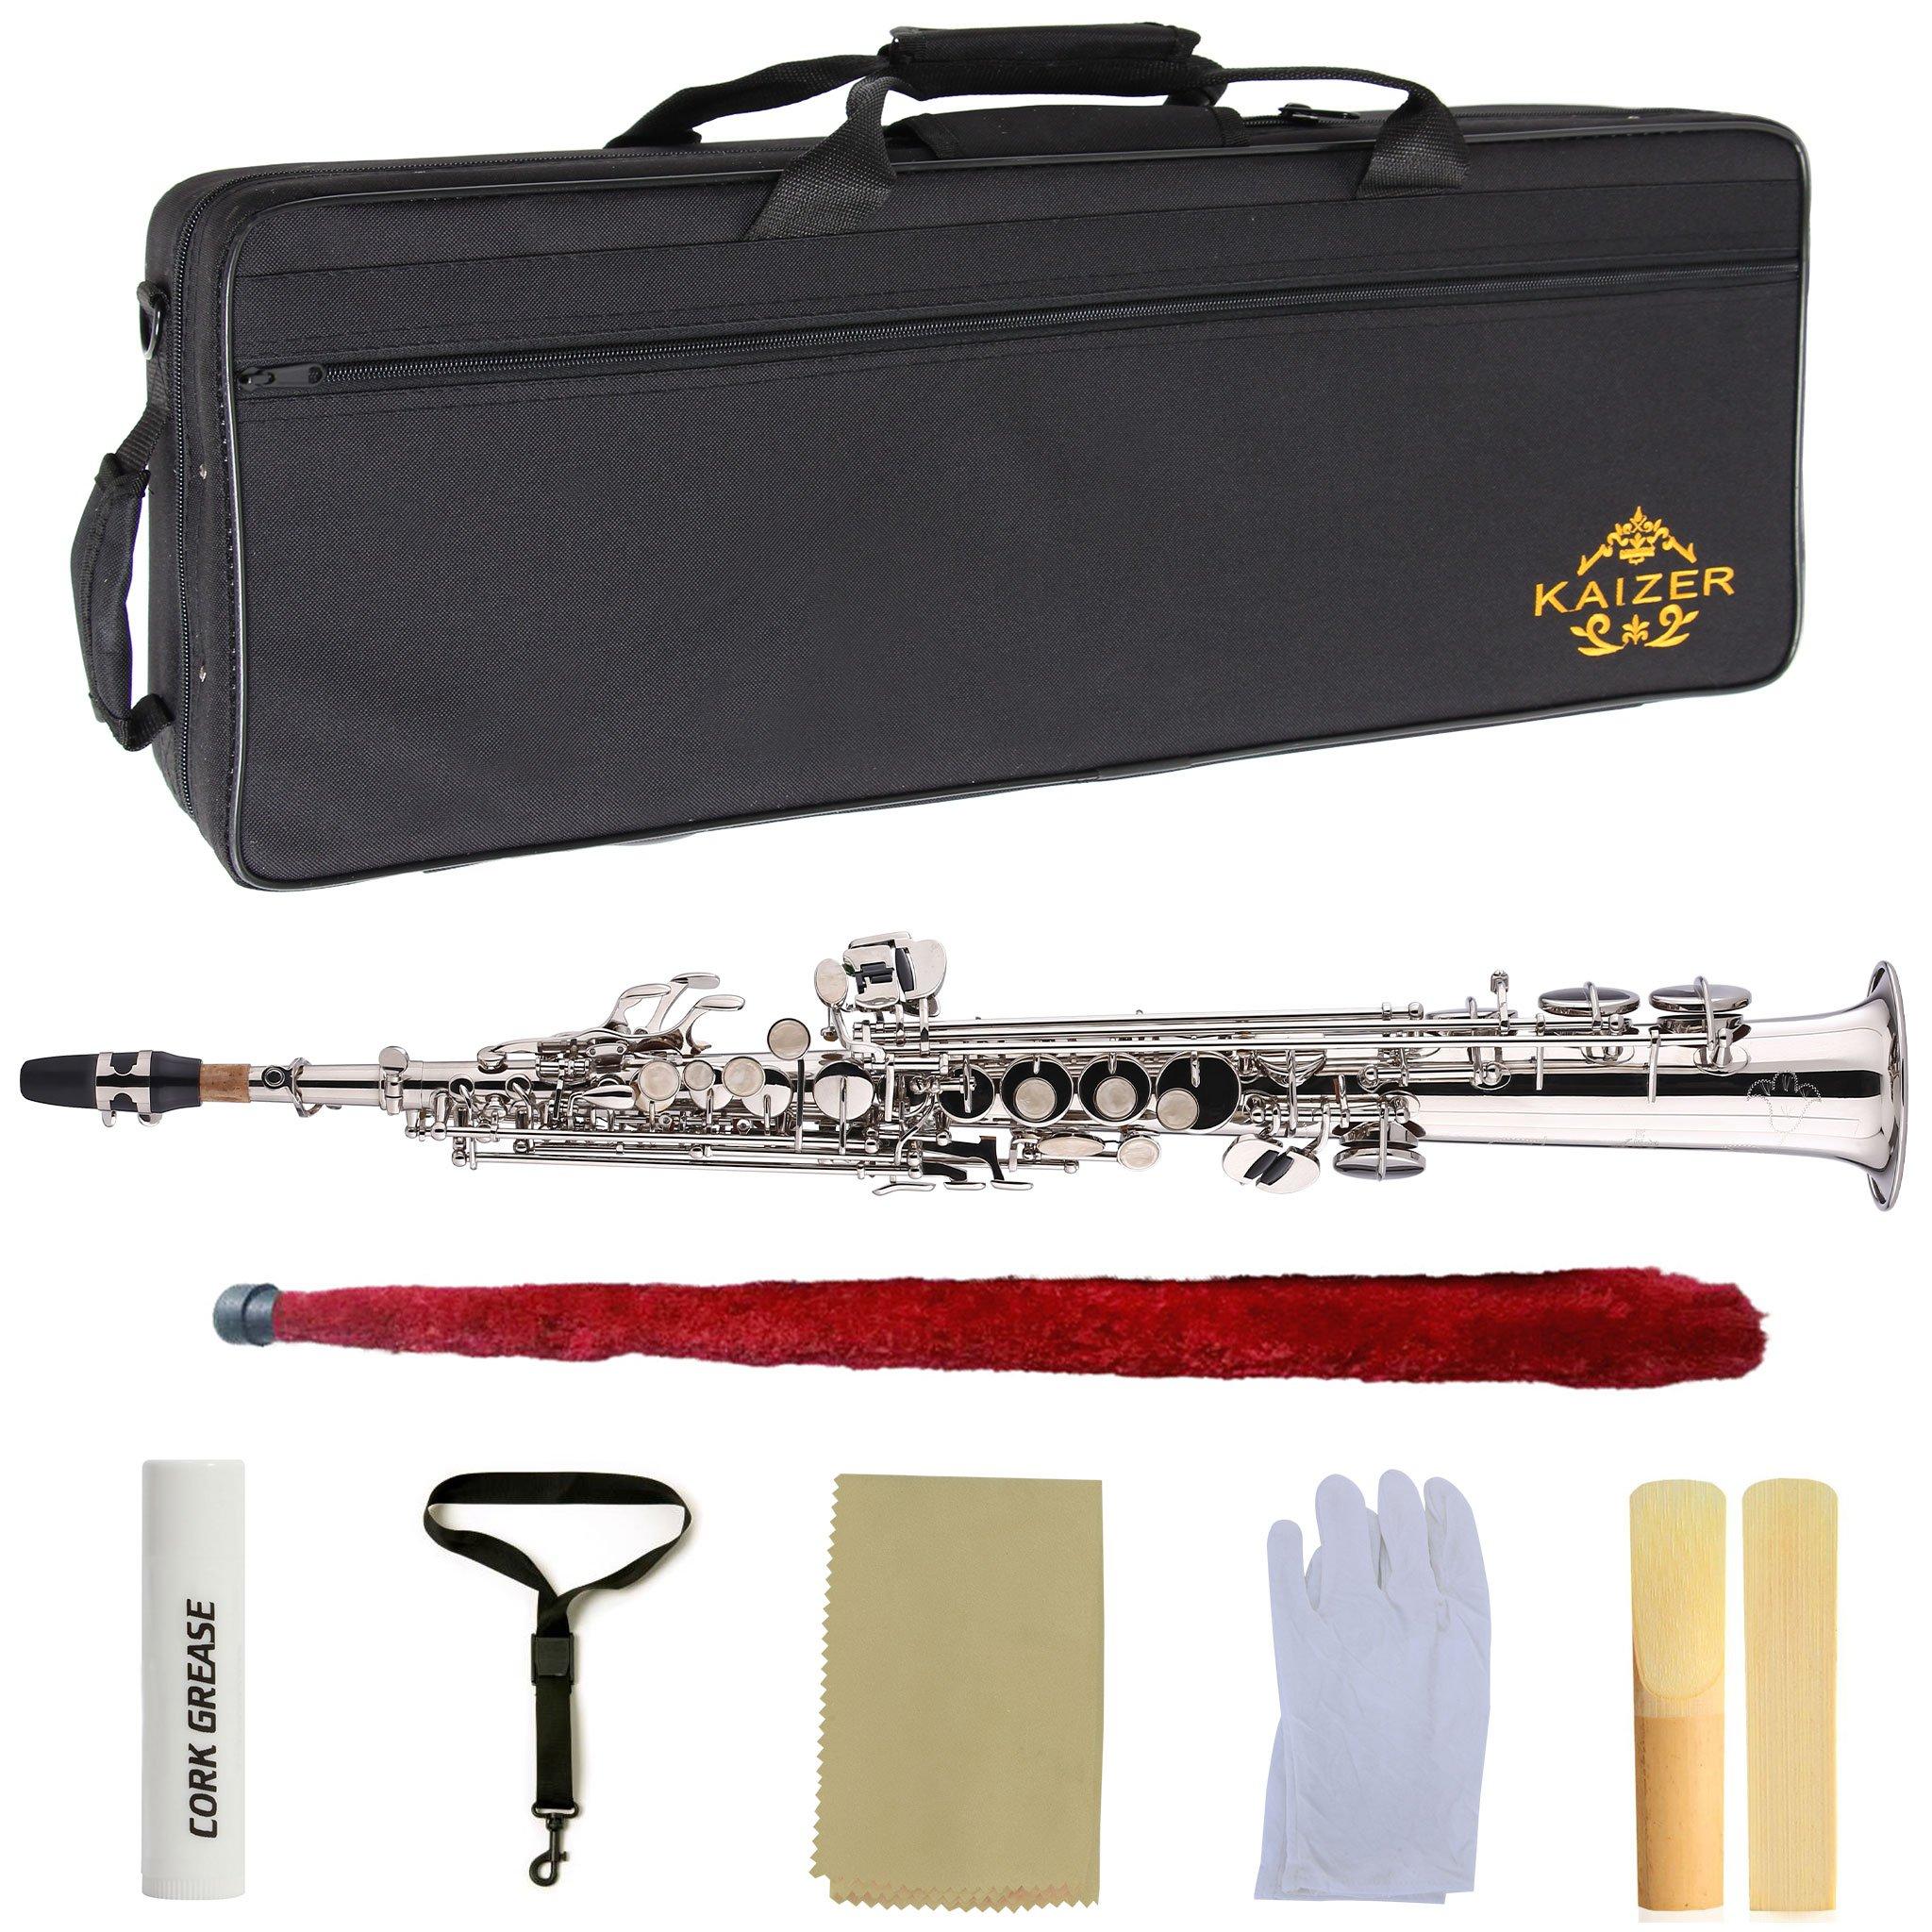 Kaizer Soprano Saxophone Straight B Flat Bb Nickel Silver SSAX-1000NK by Kaizer (Image #7)